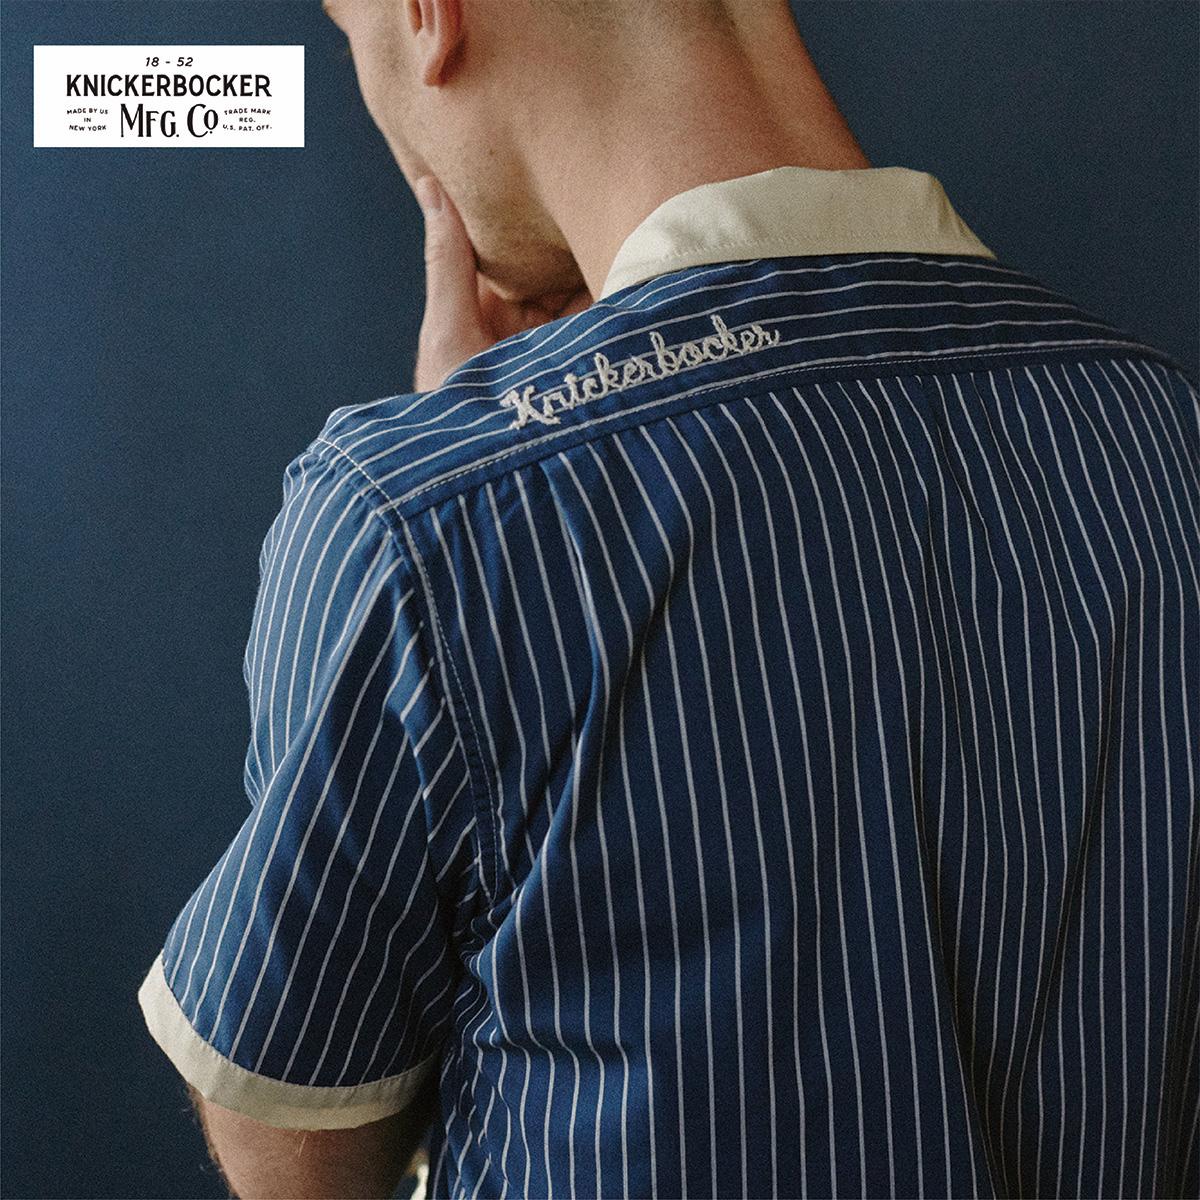 KNICKERBOCKER MFG.CO.(ニッカーボッカー)ボーリングシャツ全3色 アメリカ製